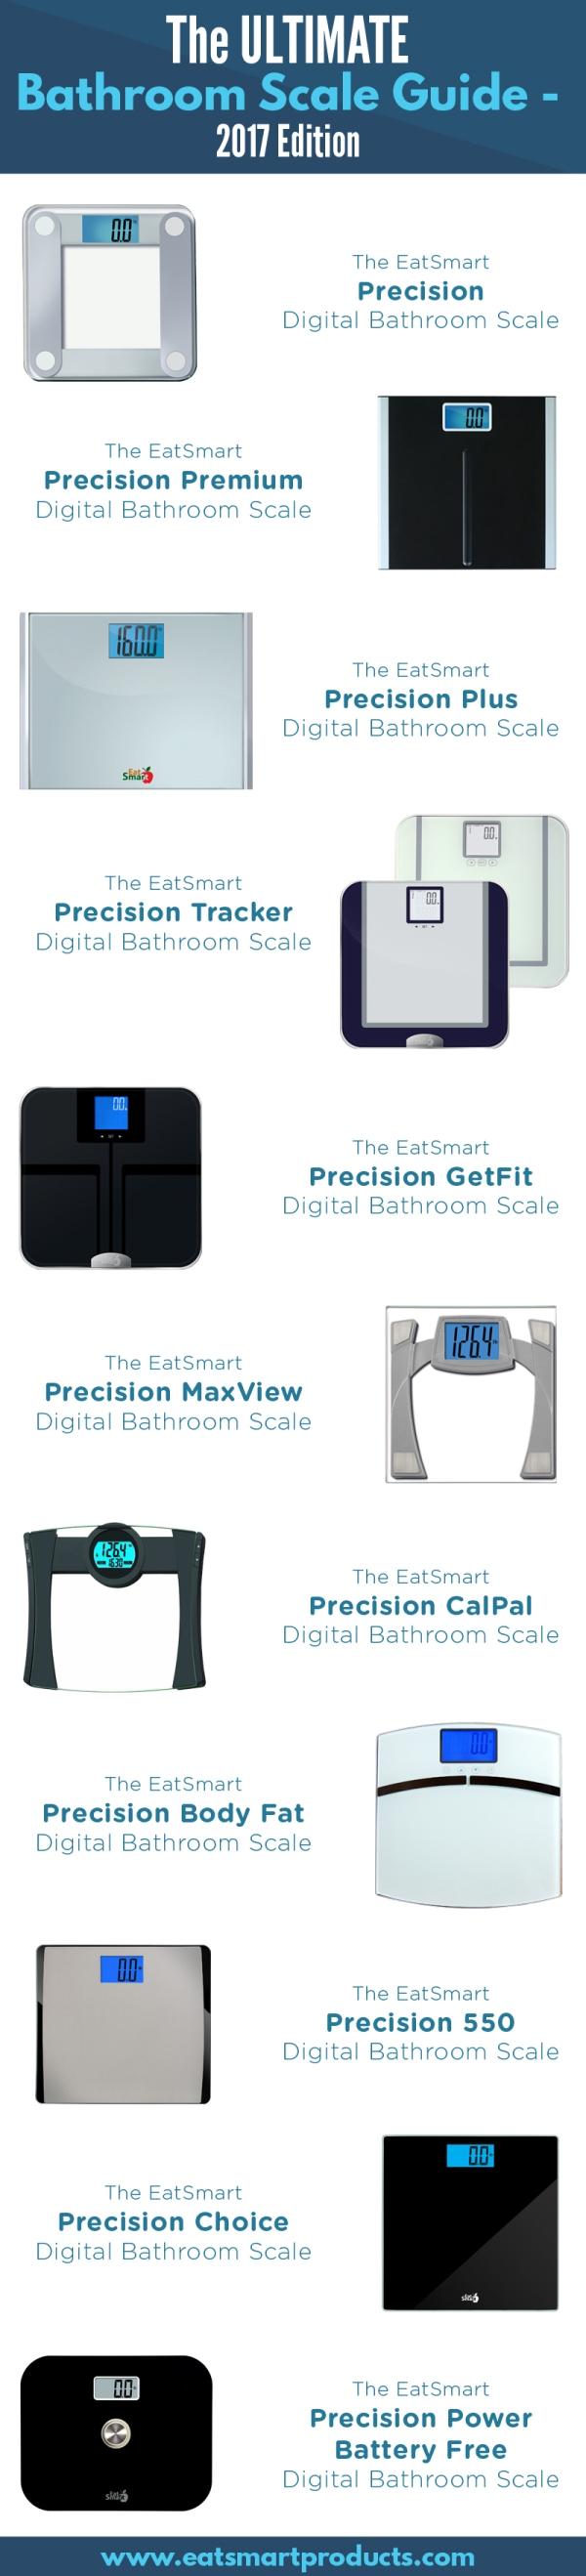 esp_ultimate_bathroom_scale_guide_list